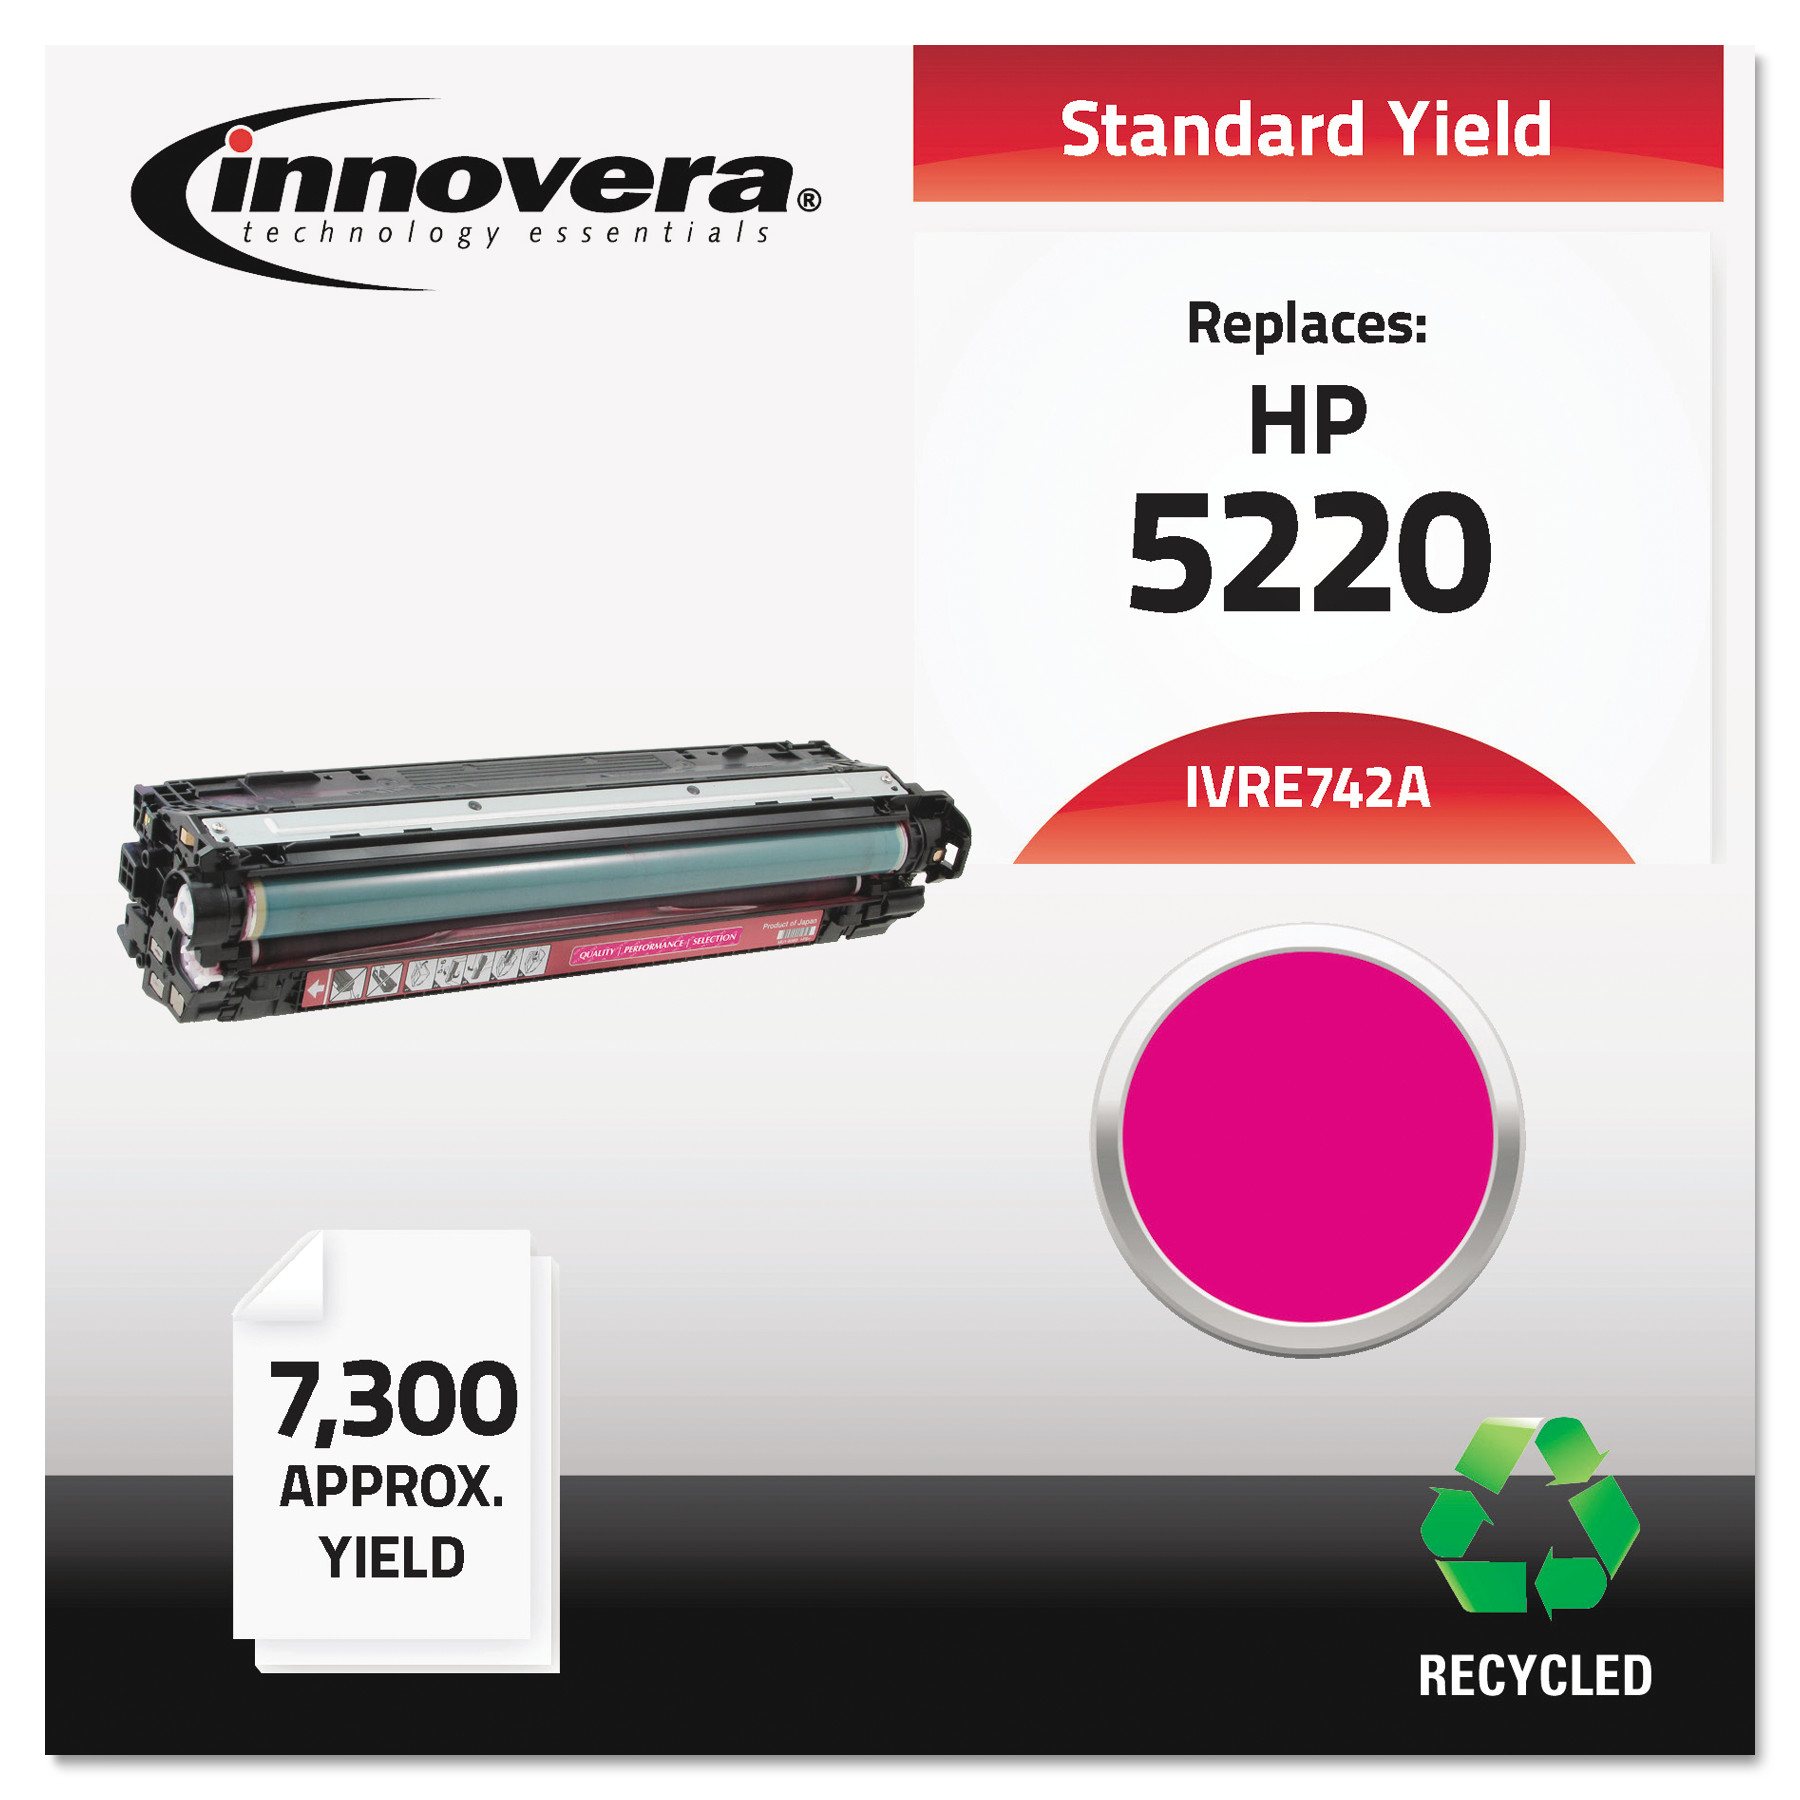 Innovera Remanufactured CE743A (CP5225) Magenta Toner Cartridge